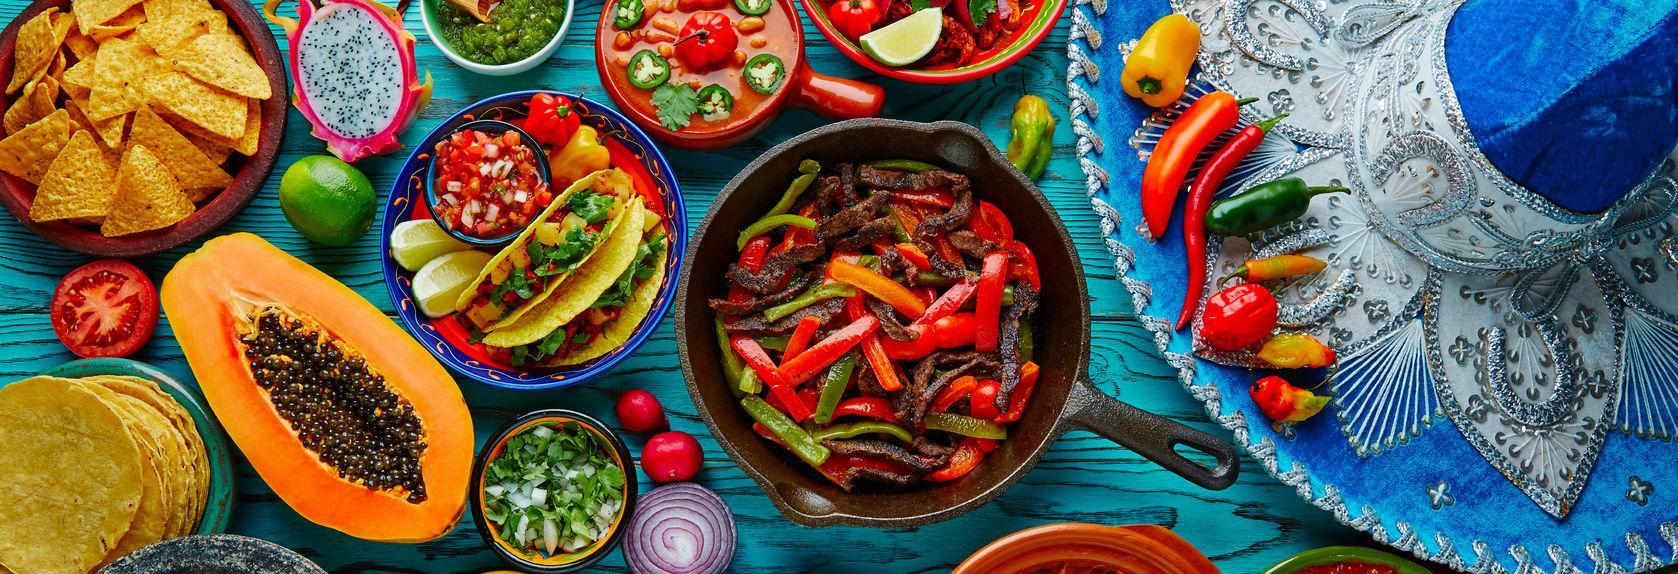 tacos, empanadas, mexican,